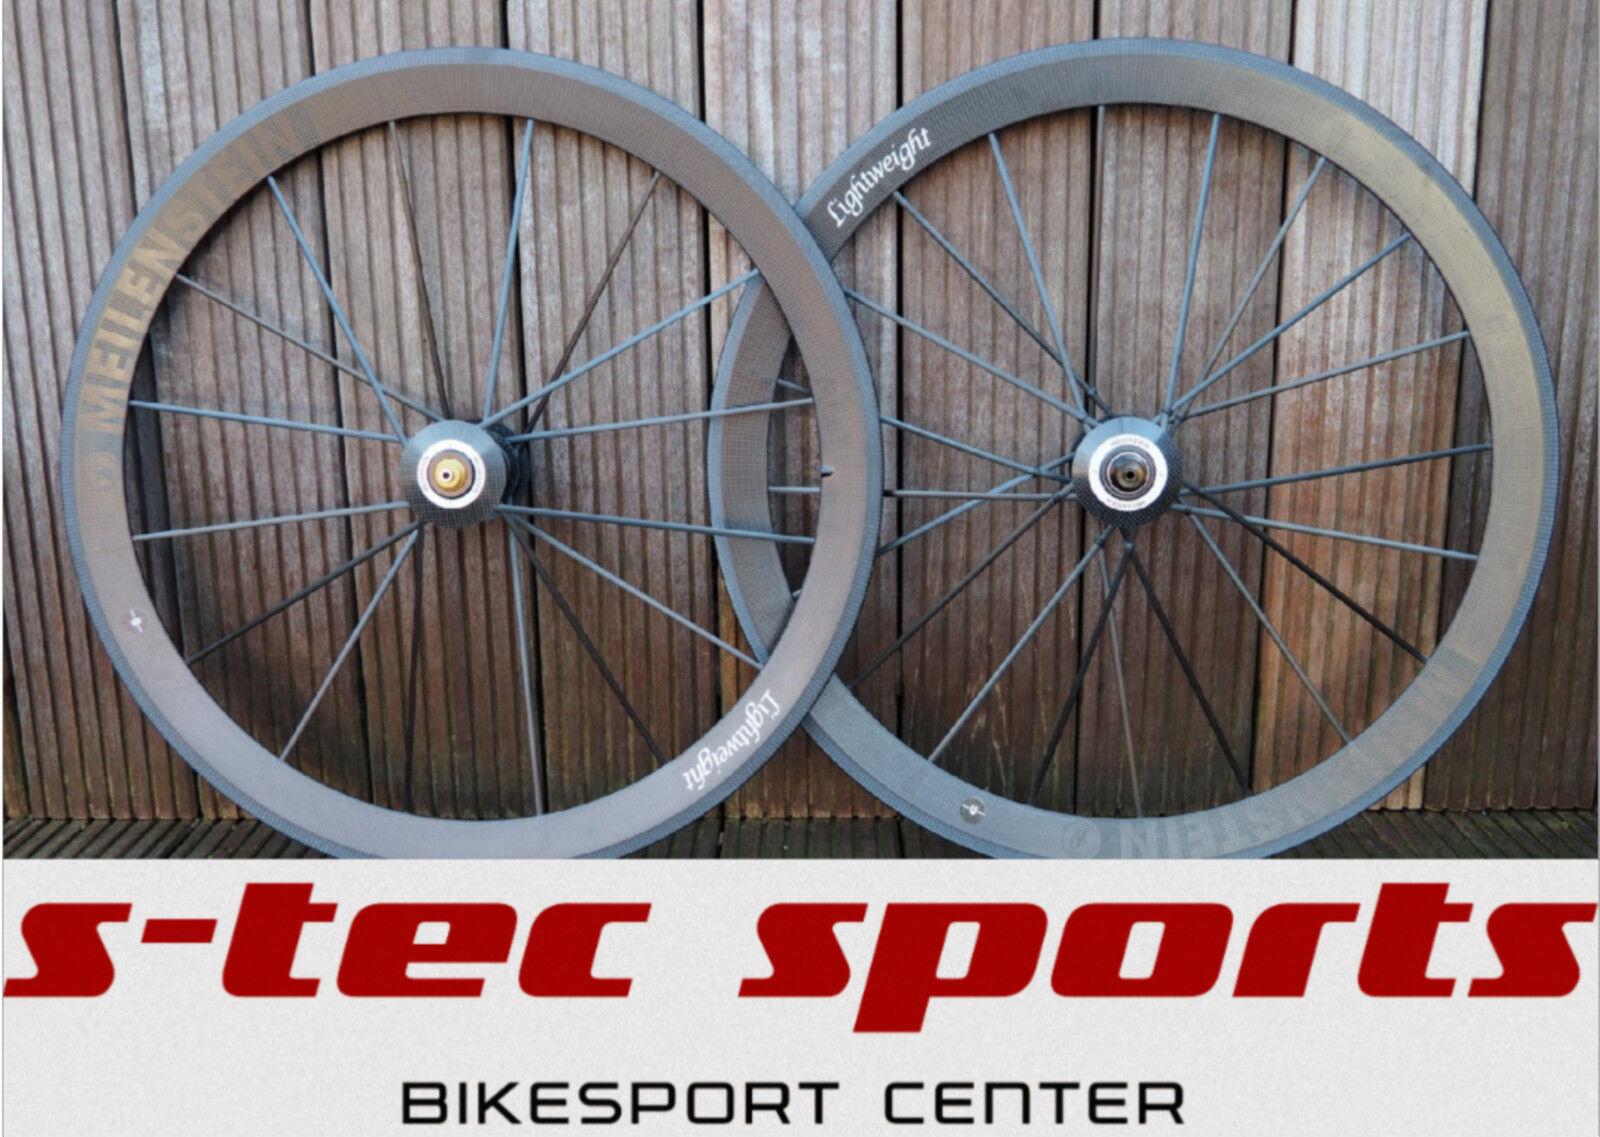 Lightweight Milestone 2015 Wheelset Carbon Clincher, Road Bike, Roadbike